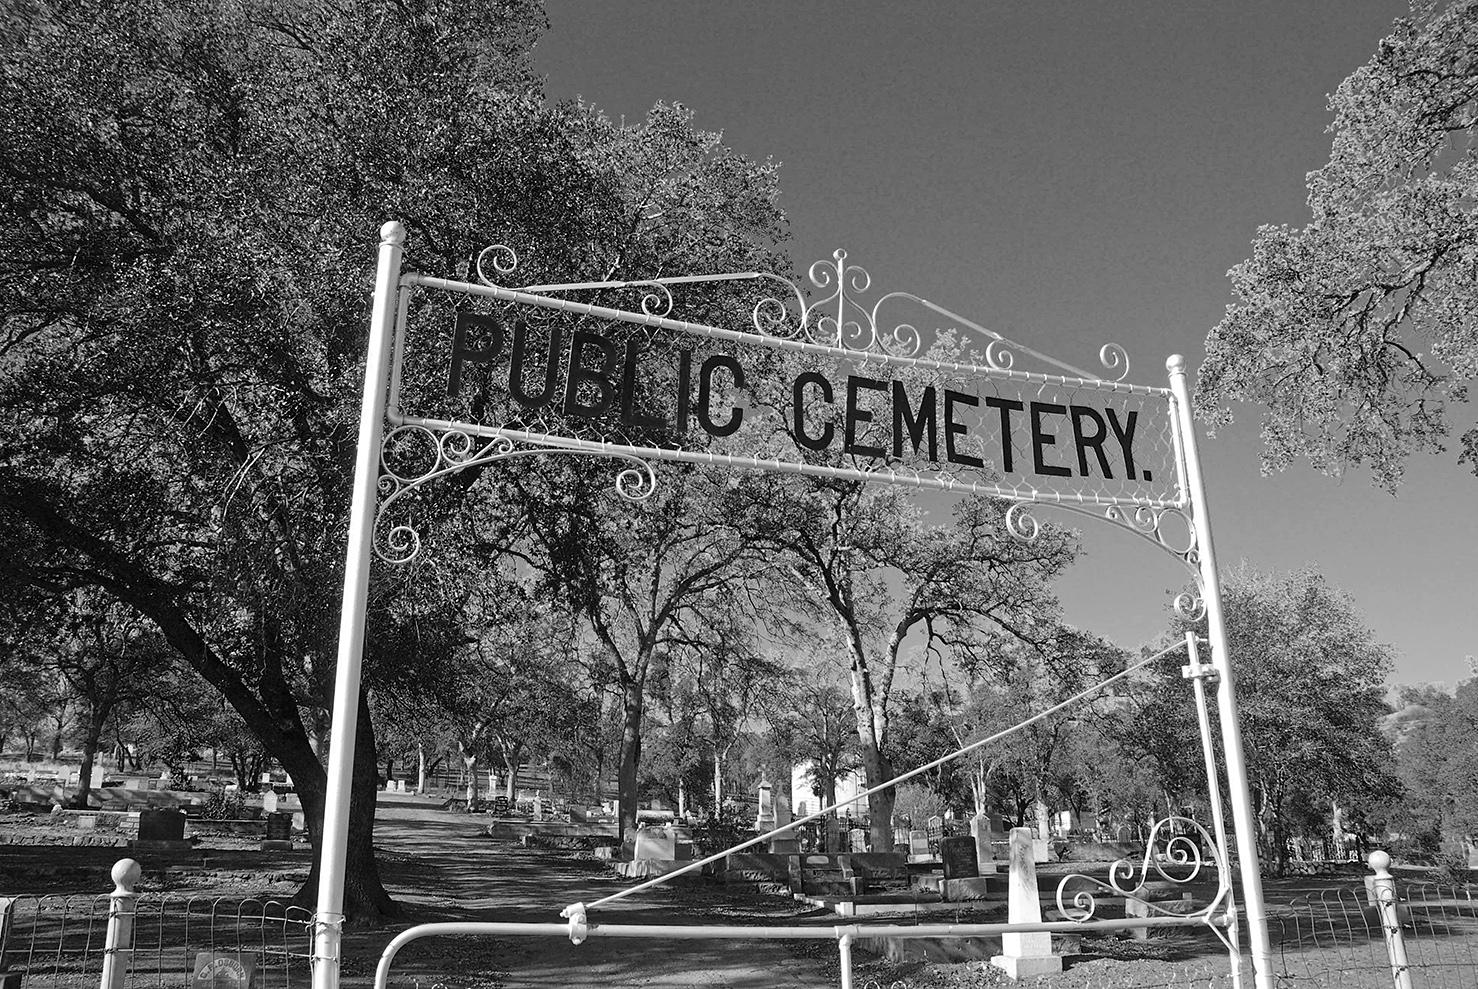 Coulterville Public Cemetery Public Cemetery Sign.jpg